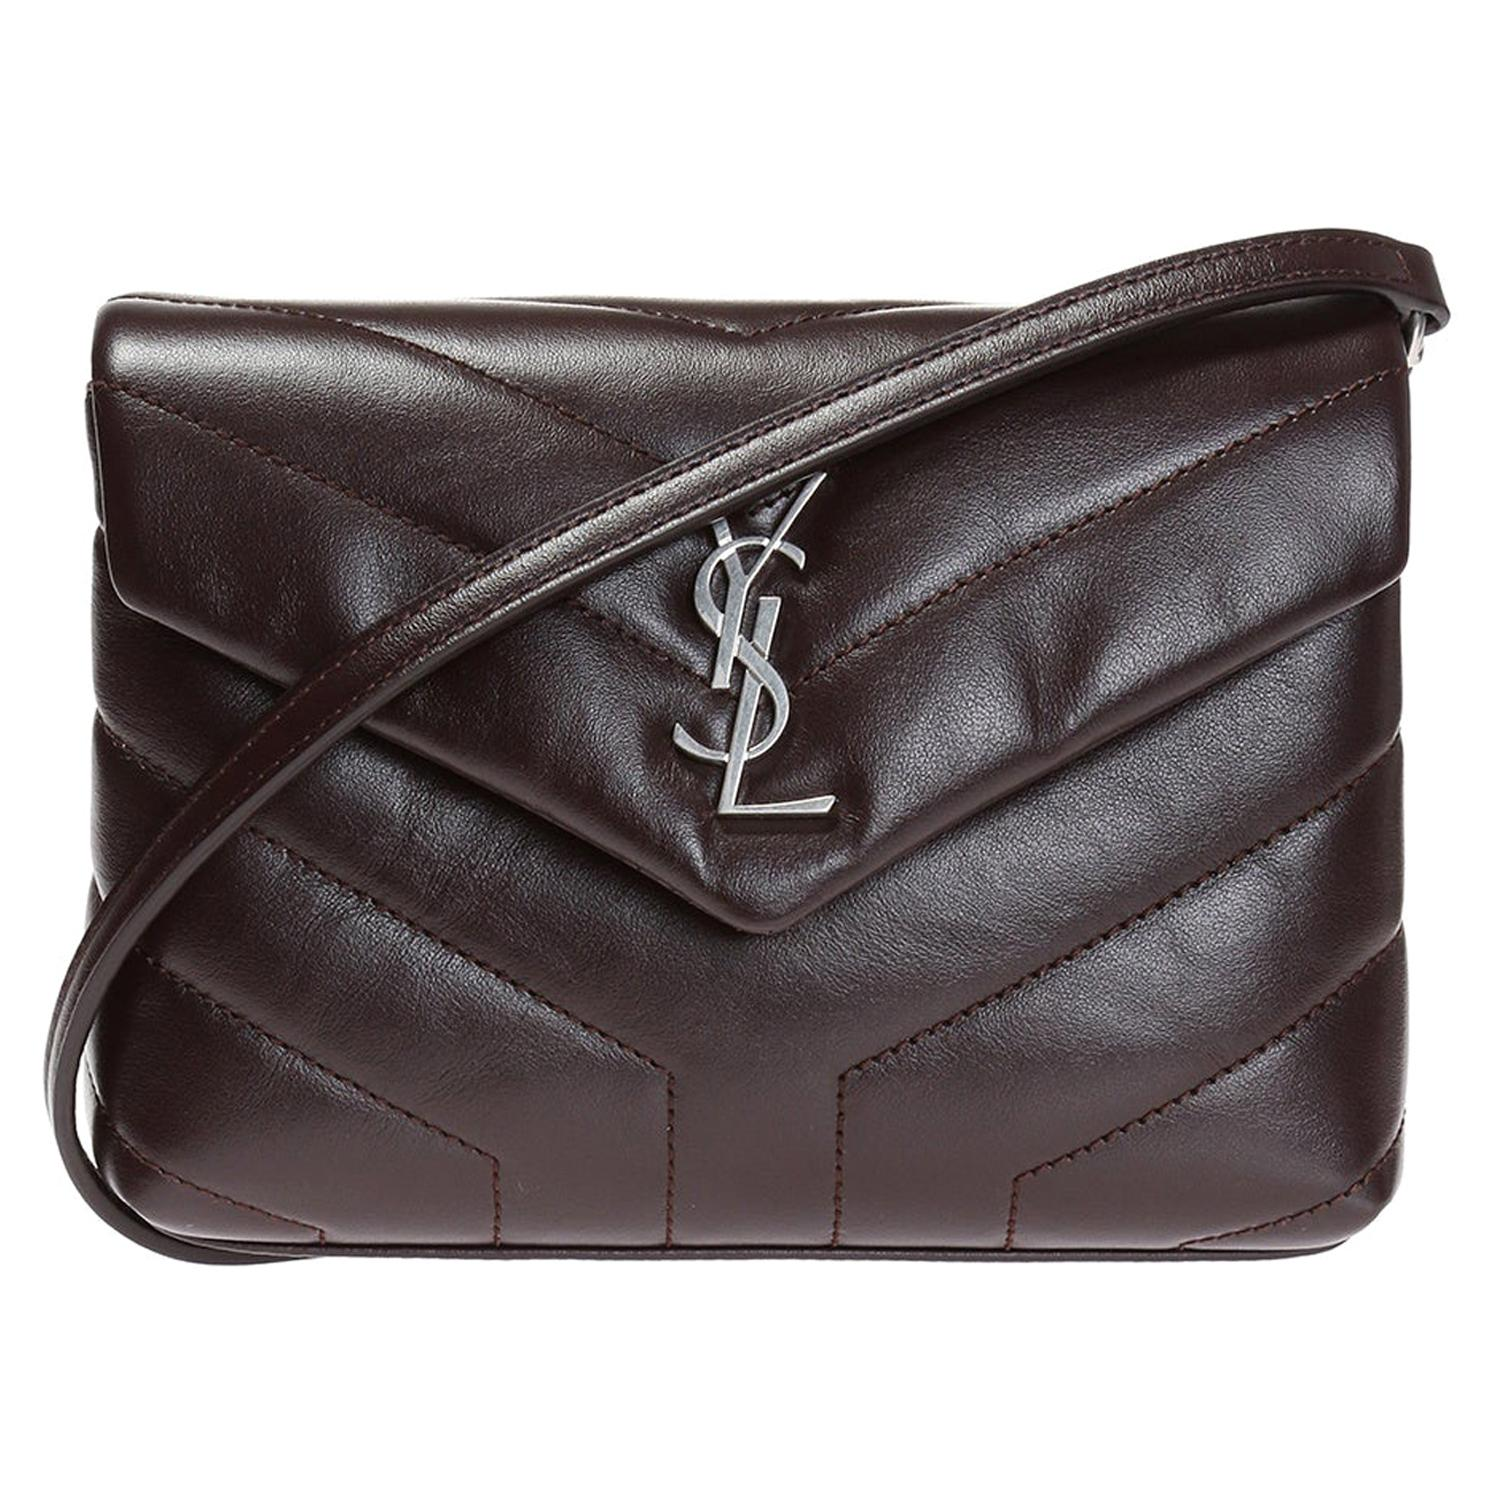 Saint Laurent Dark Brown / Plum Leather Loulou Toy Strap Shoulder Bag